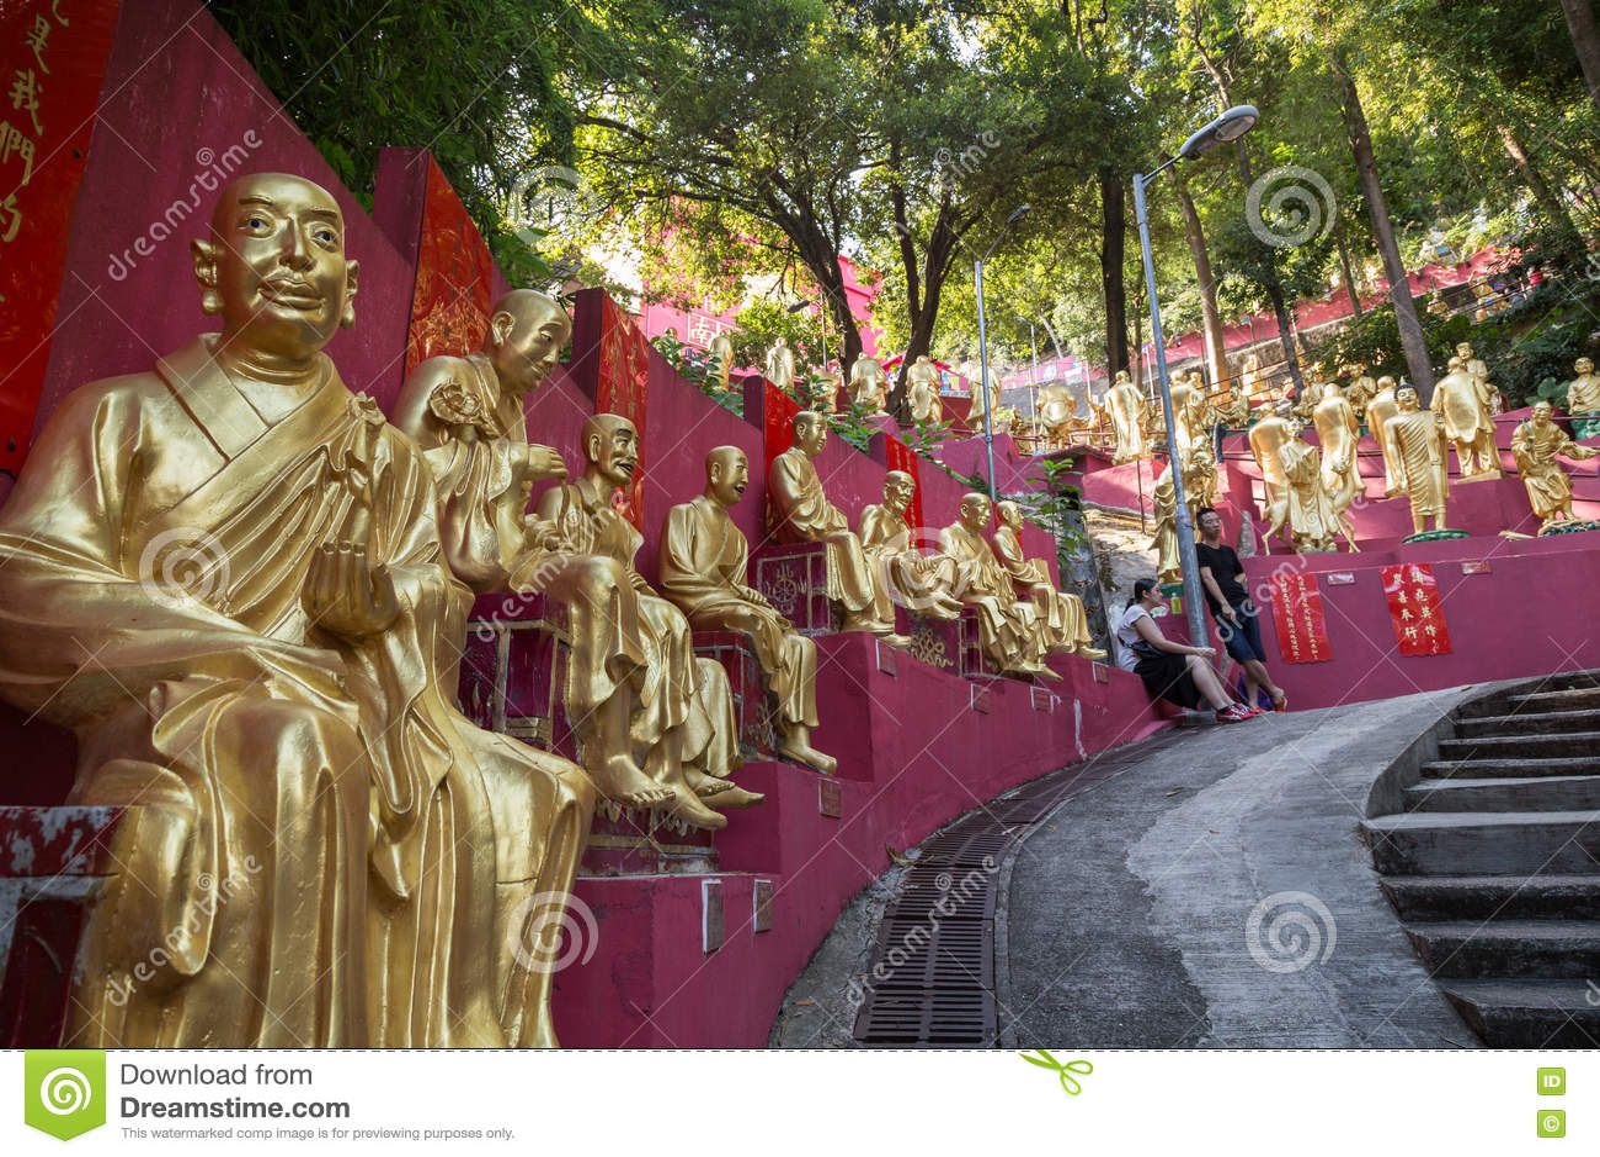 Path to the Ten Thousand Buddhas Monastery in Hong Kong